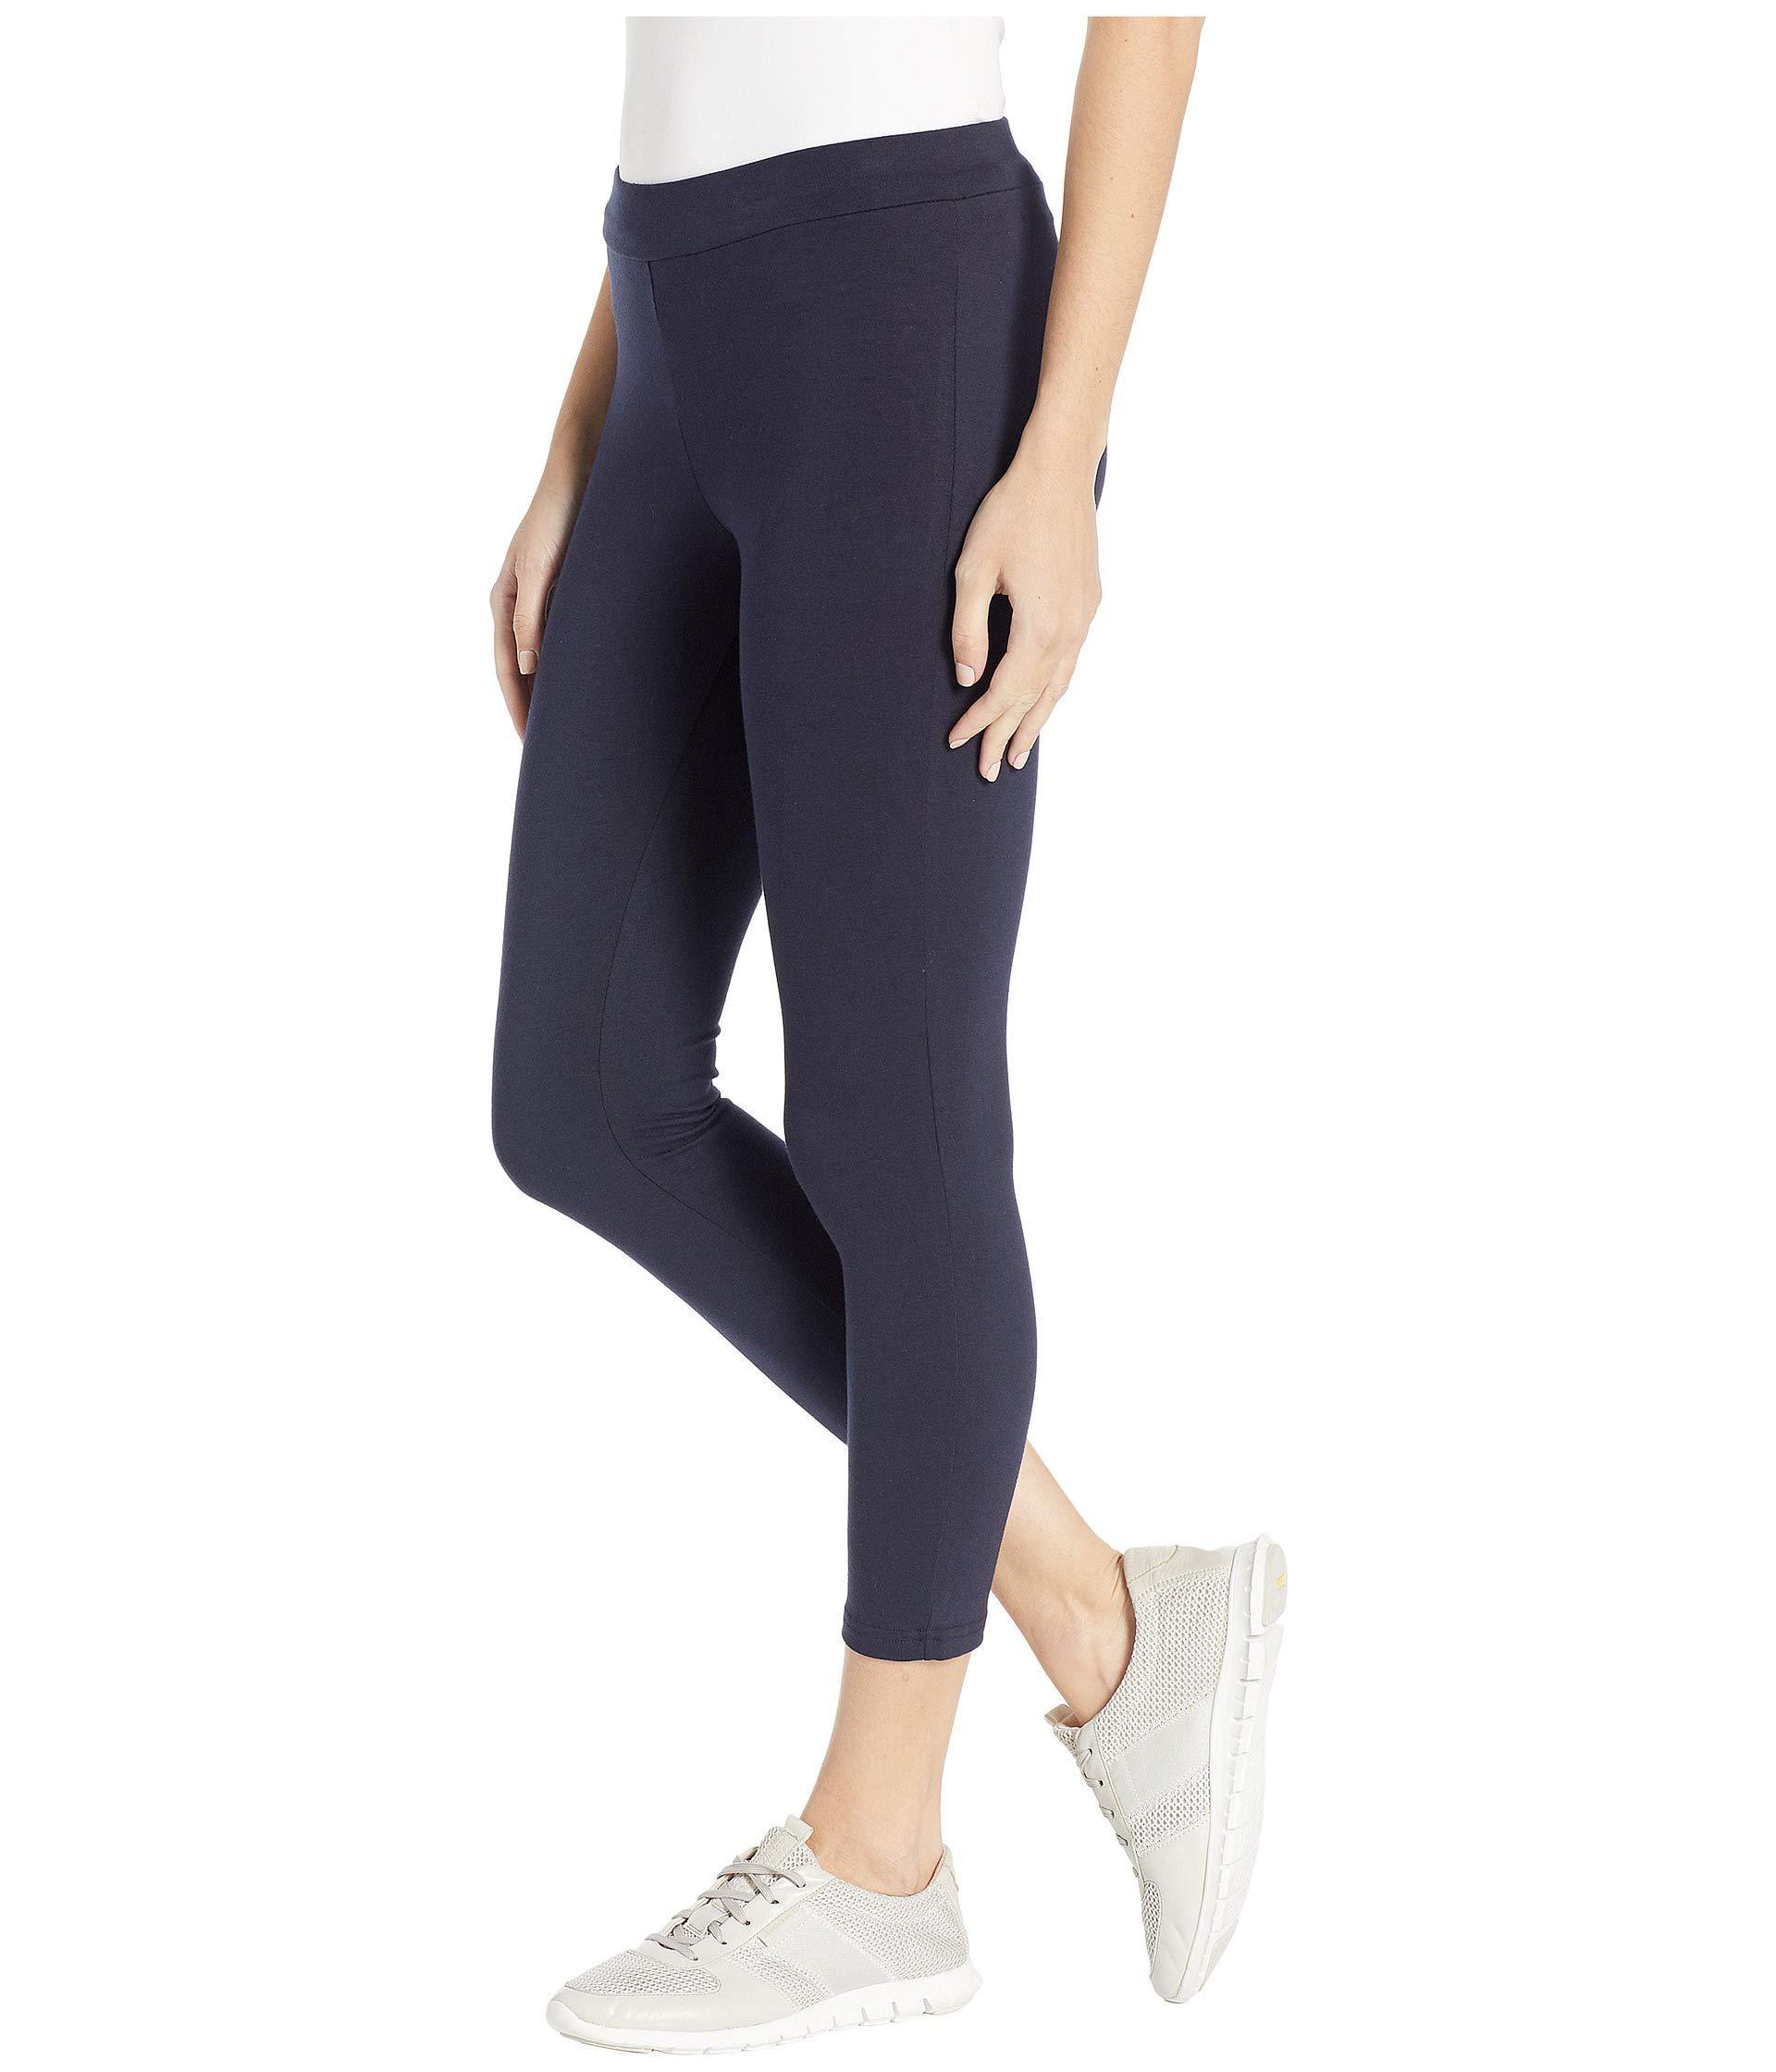 718f43f53f2 Lyst - Hue Wide Waistband Blackout Cotton Capri Leggings (black) Women s  Casual Pants in Blue